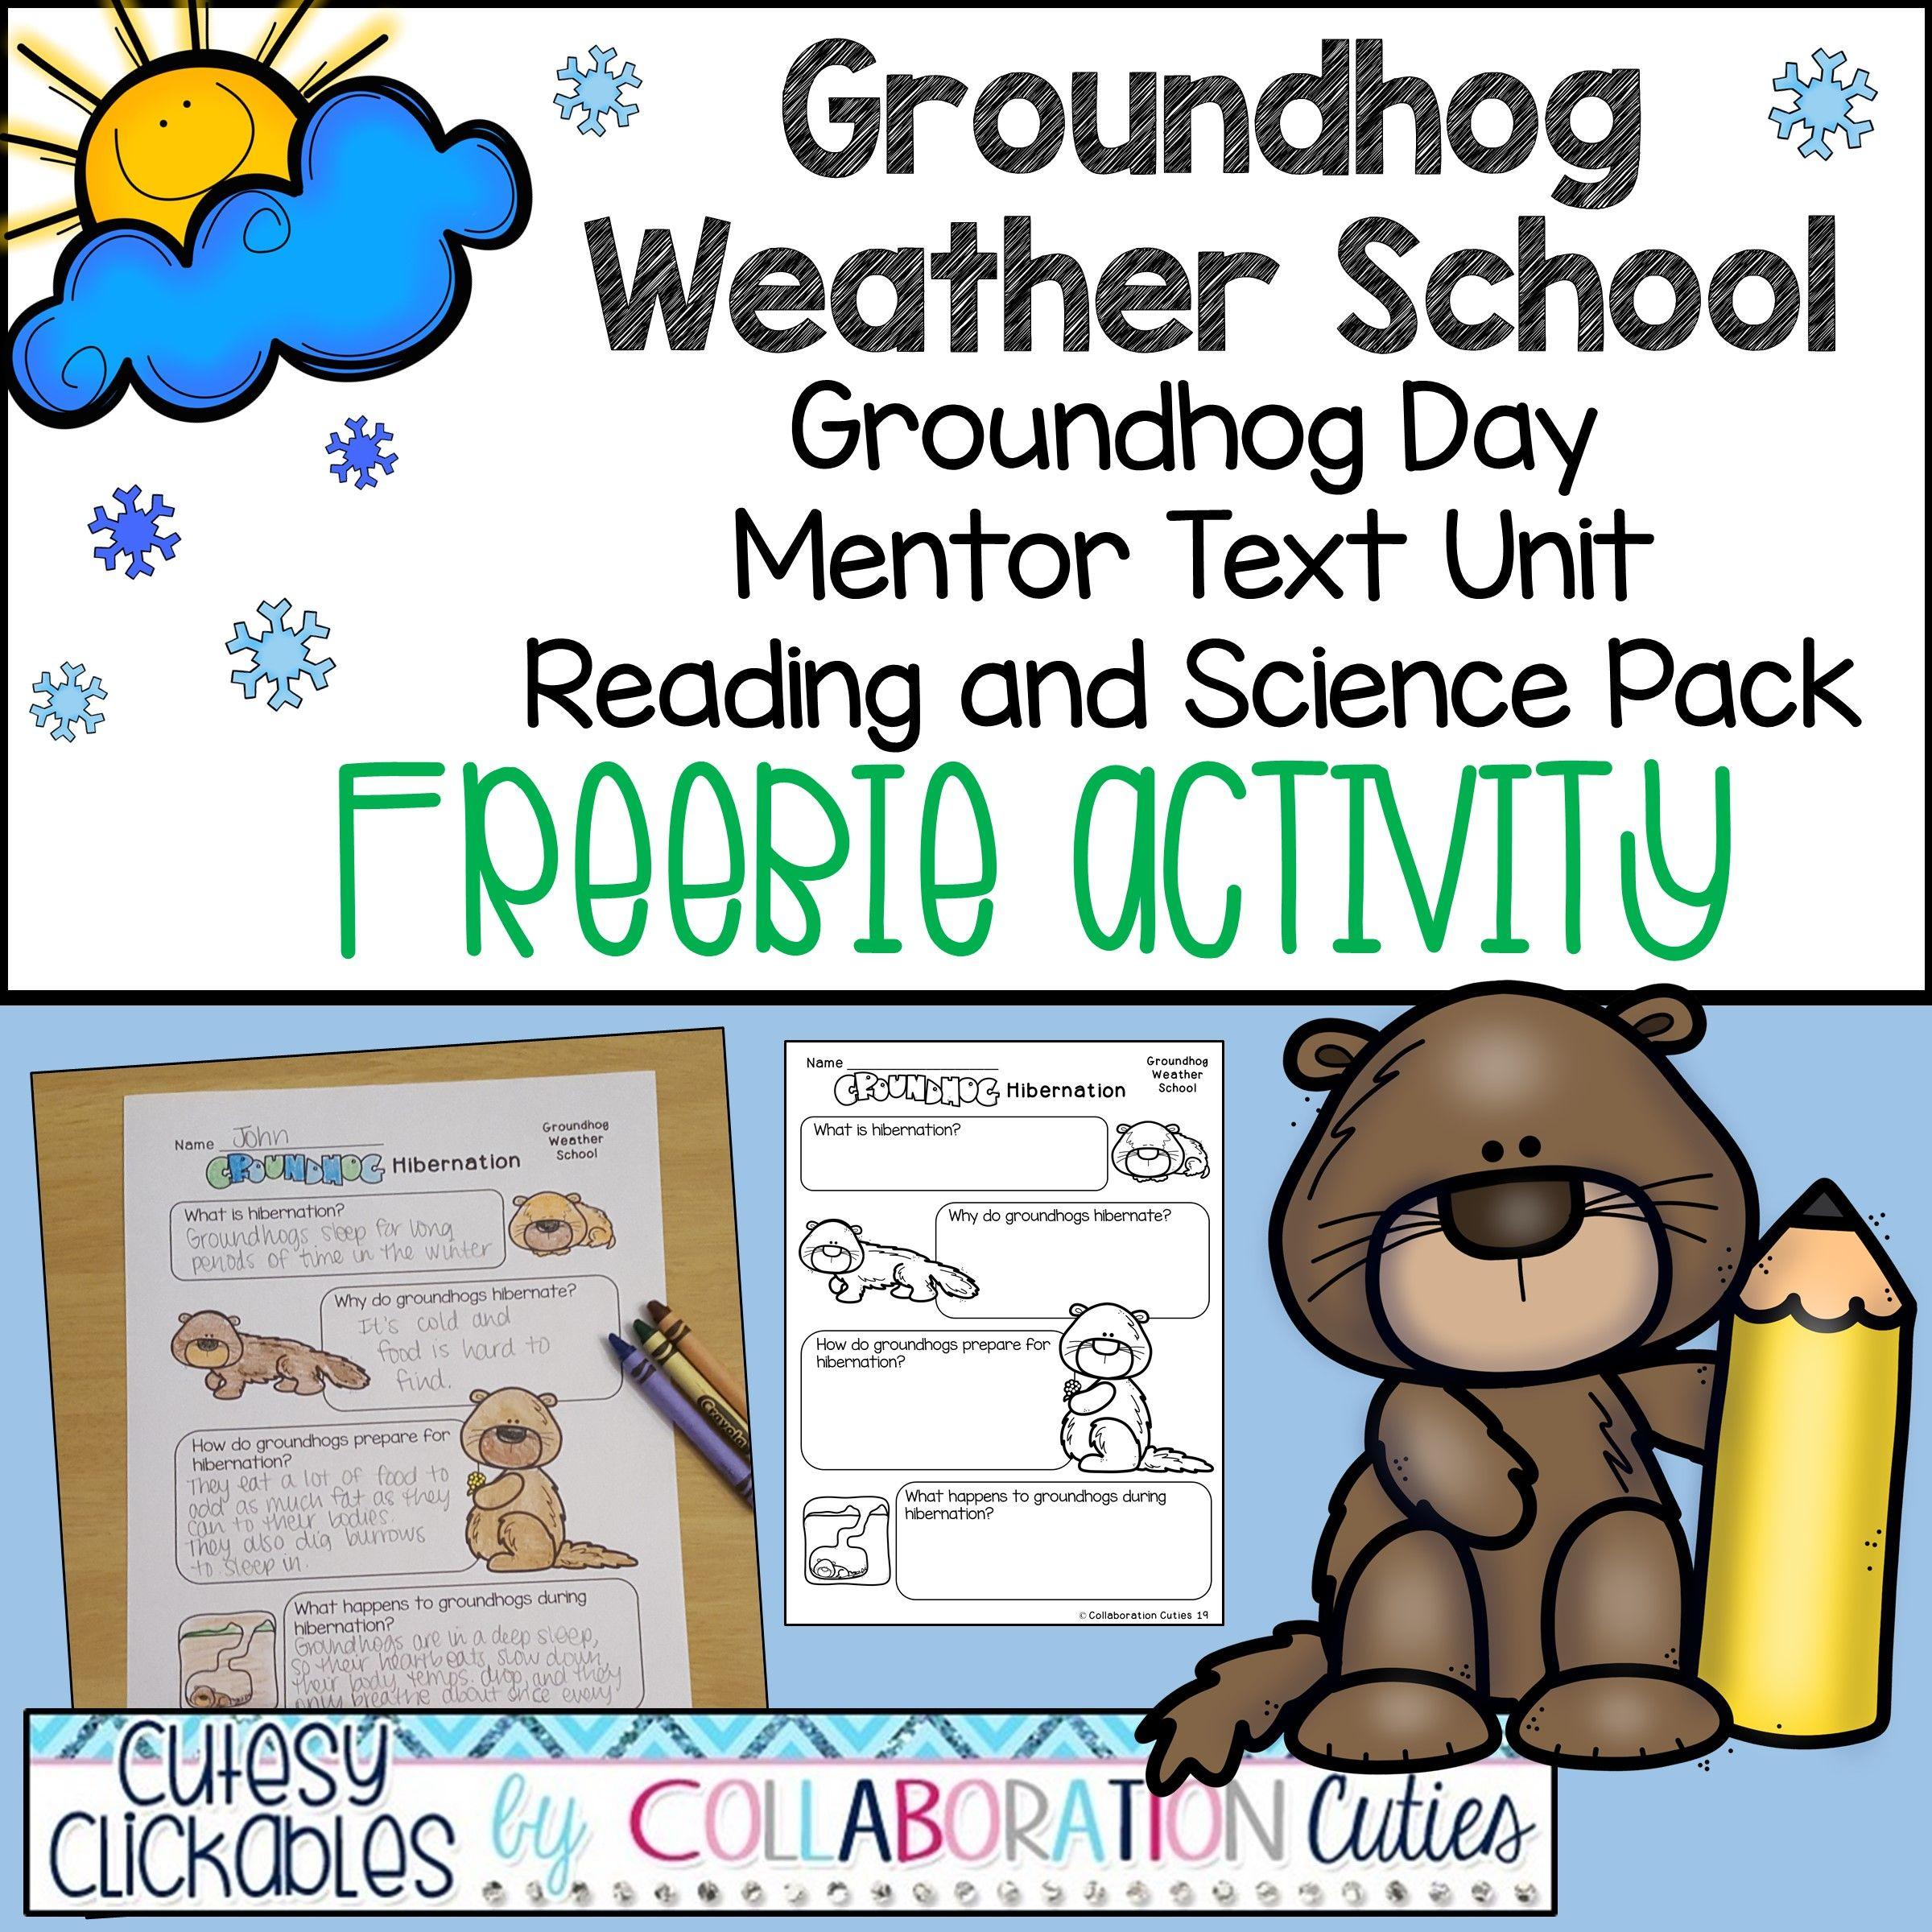 Groundhog Weather School Freebie Activity Groundhog Day